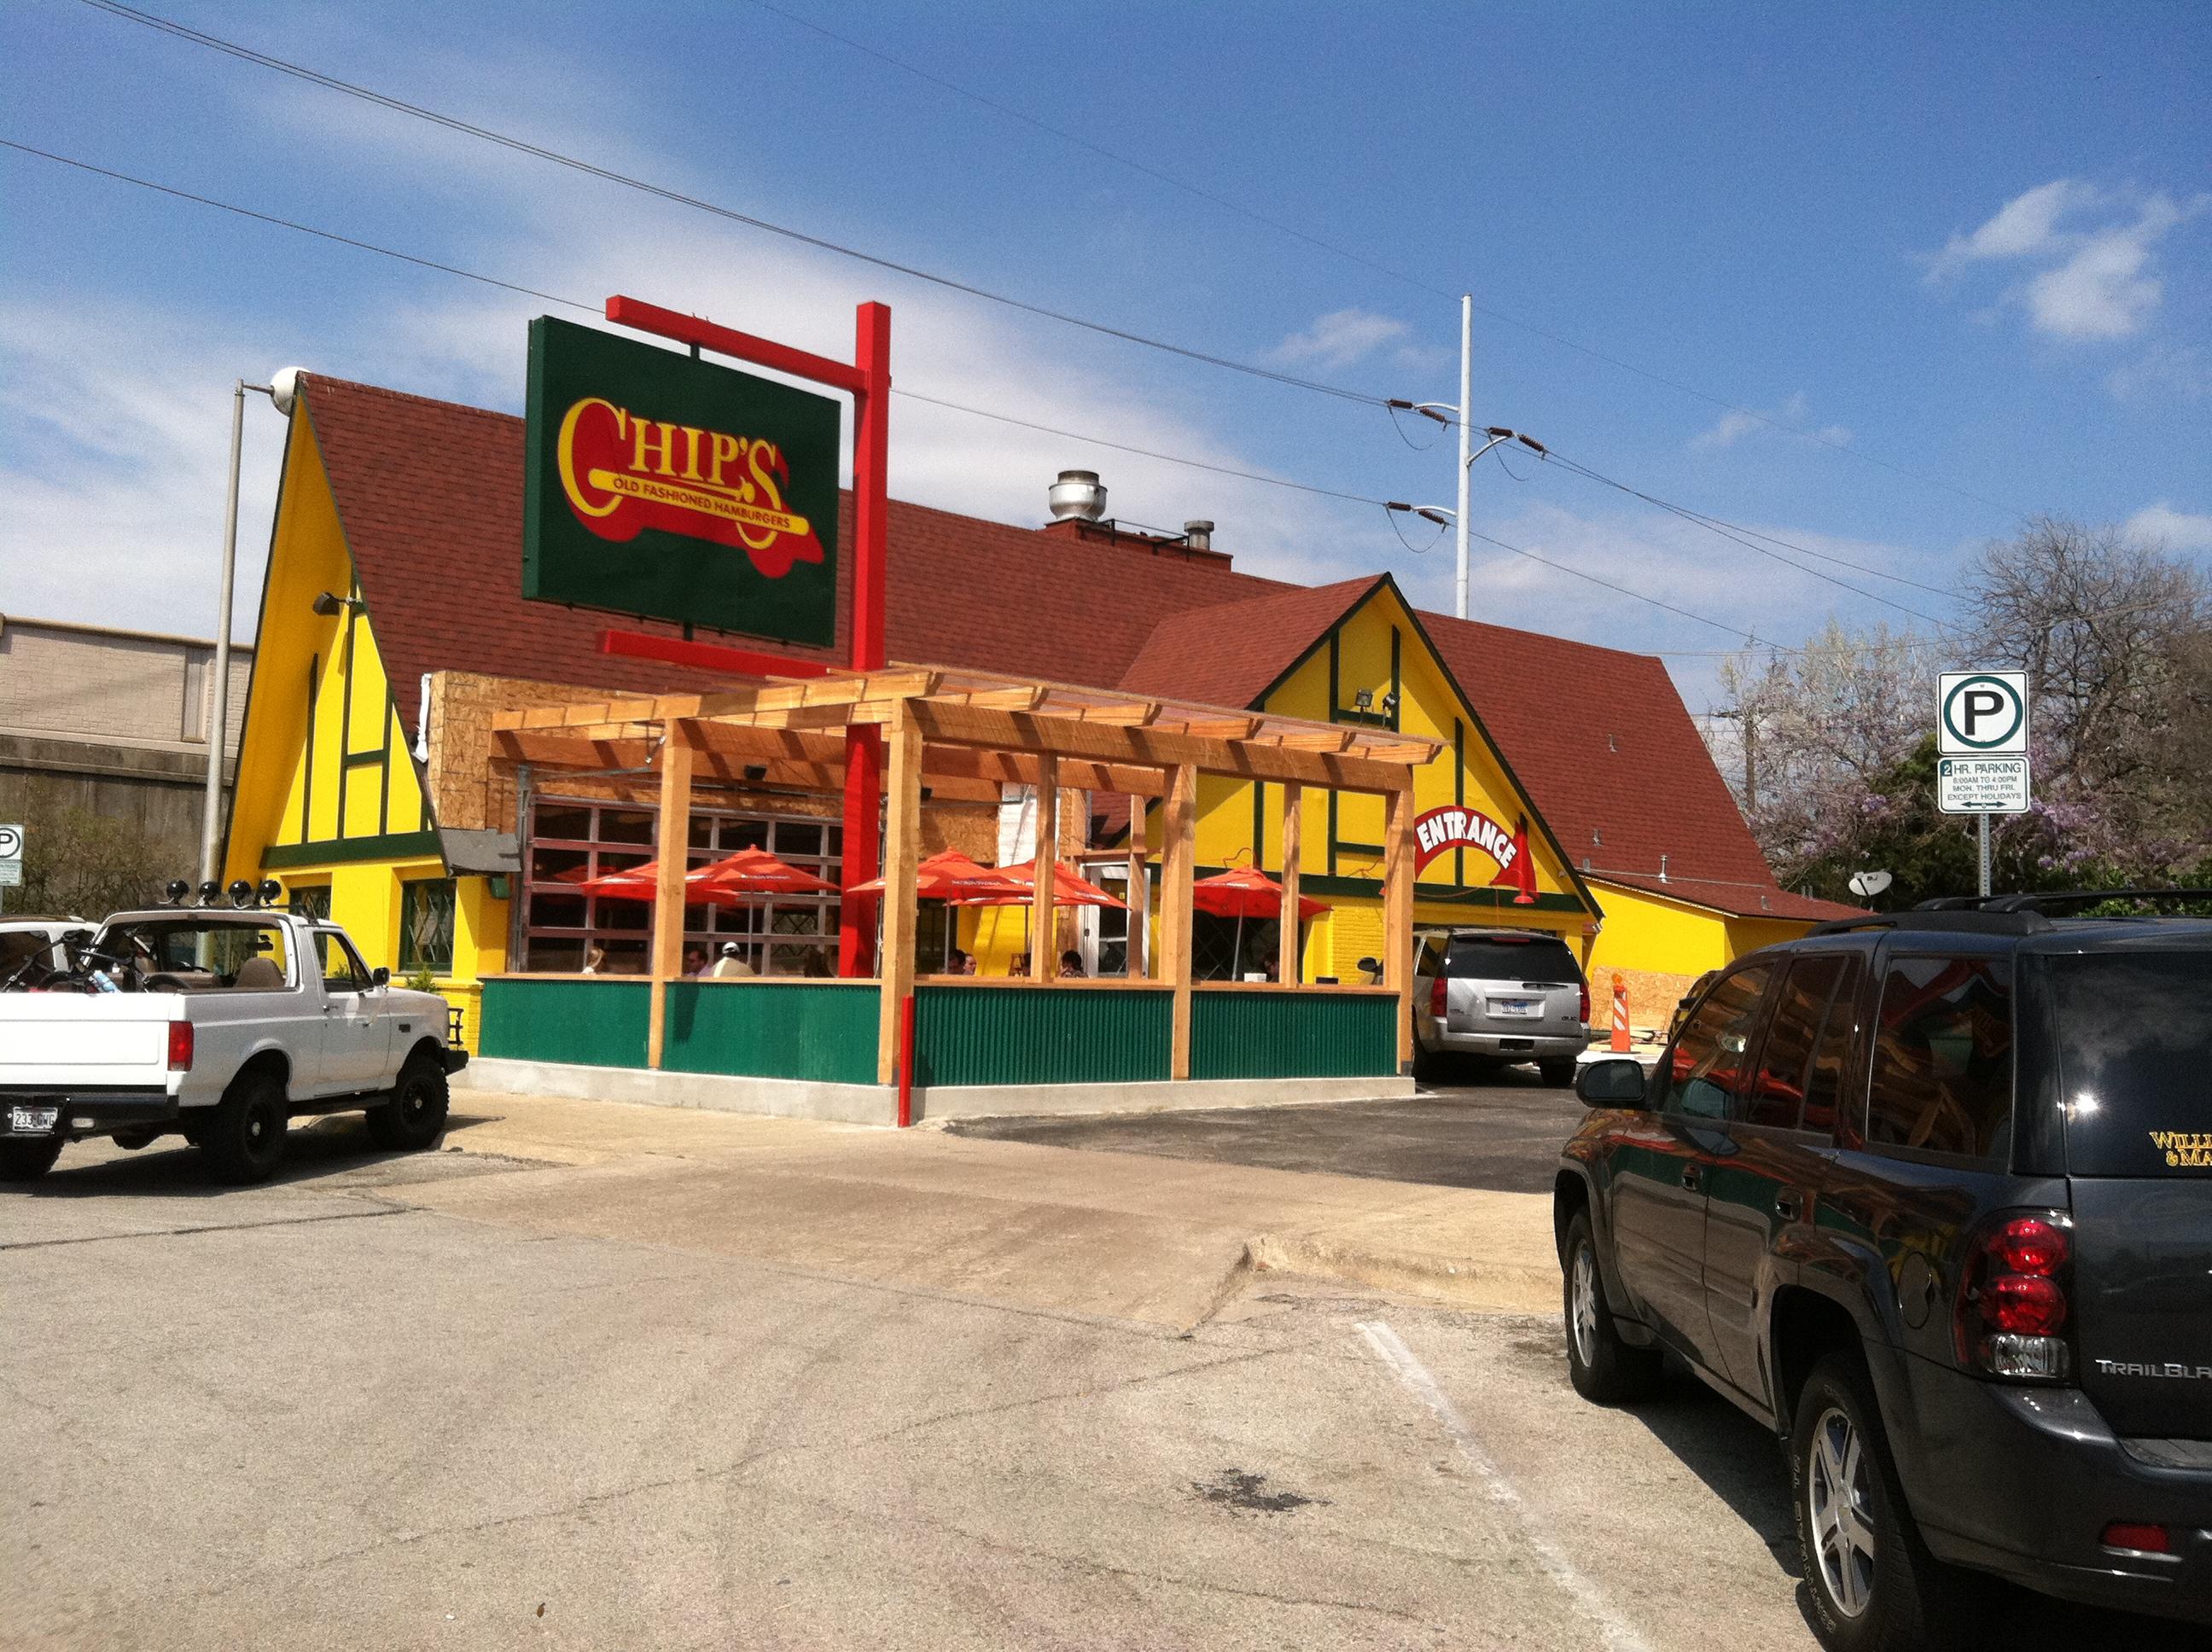 Chip's Old Fashioned Hamburgers